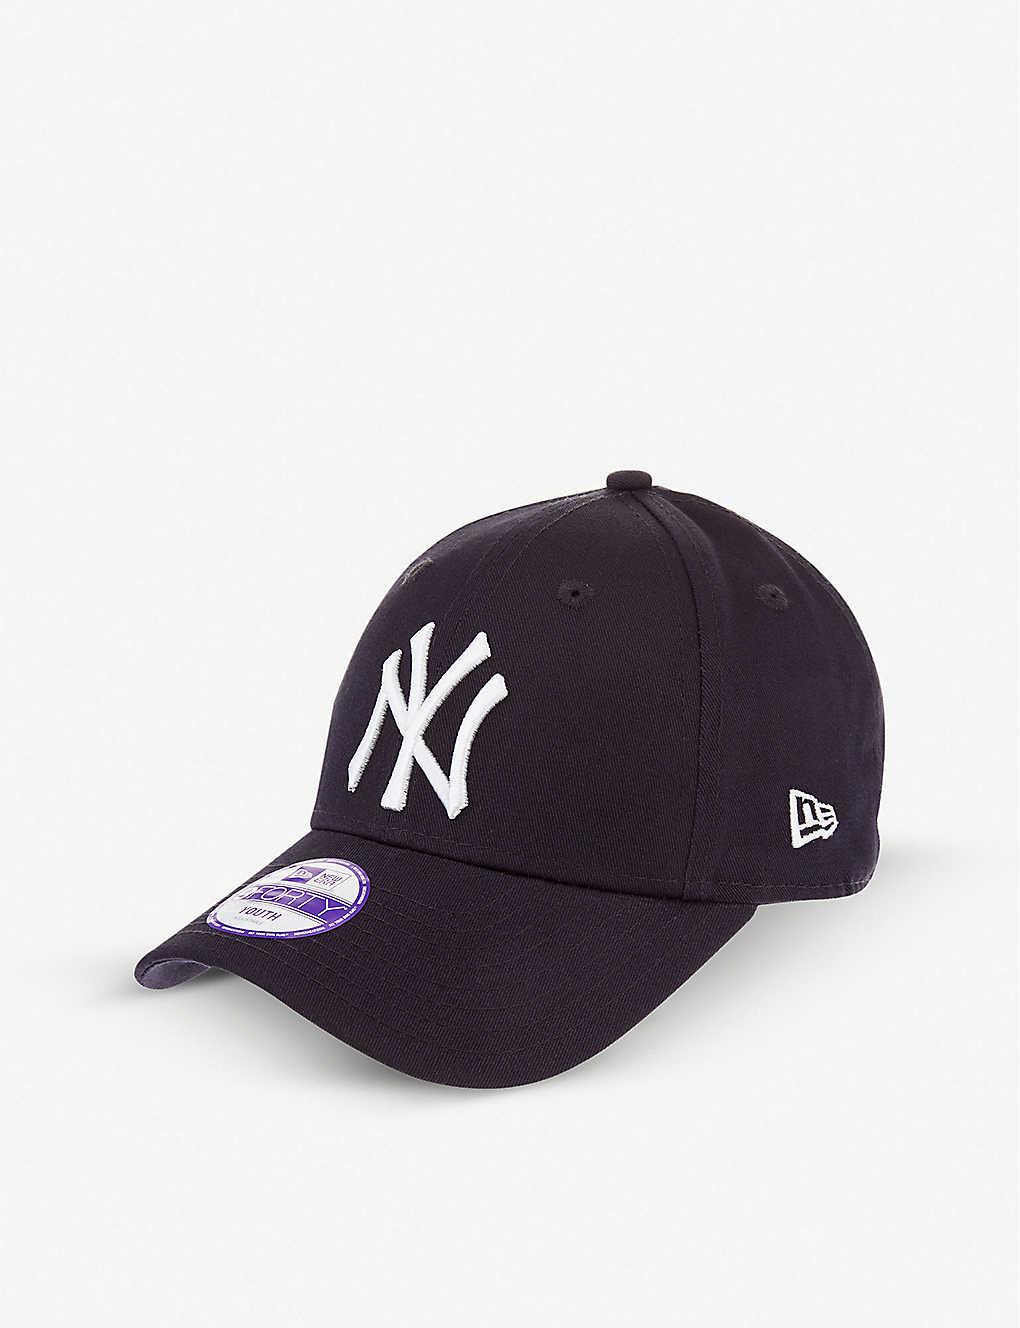 NEW ERA - New york yankee 9forty baseball cap  3123285d3d89